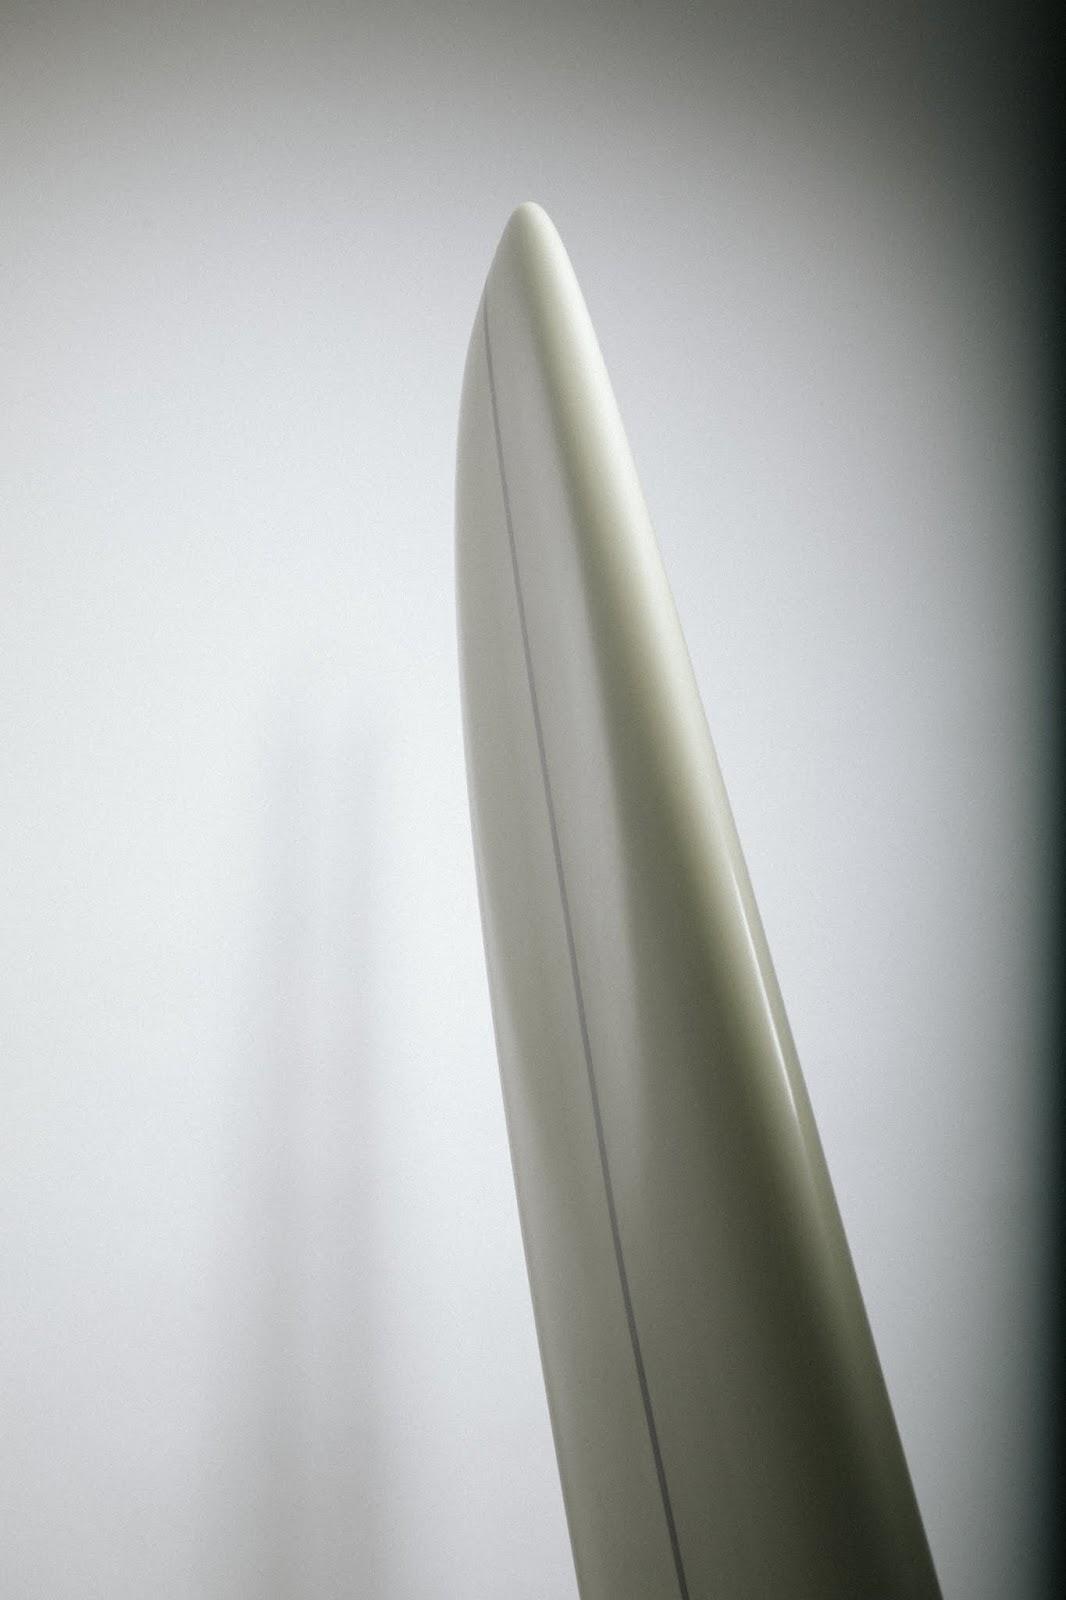 surfinestate log longboard singlefin glasson starship pig shape handshape shaper Hossegor France Vincent Lemanceau Arthur Nelli